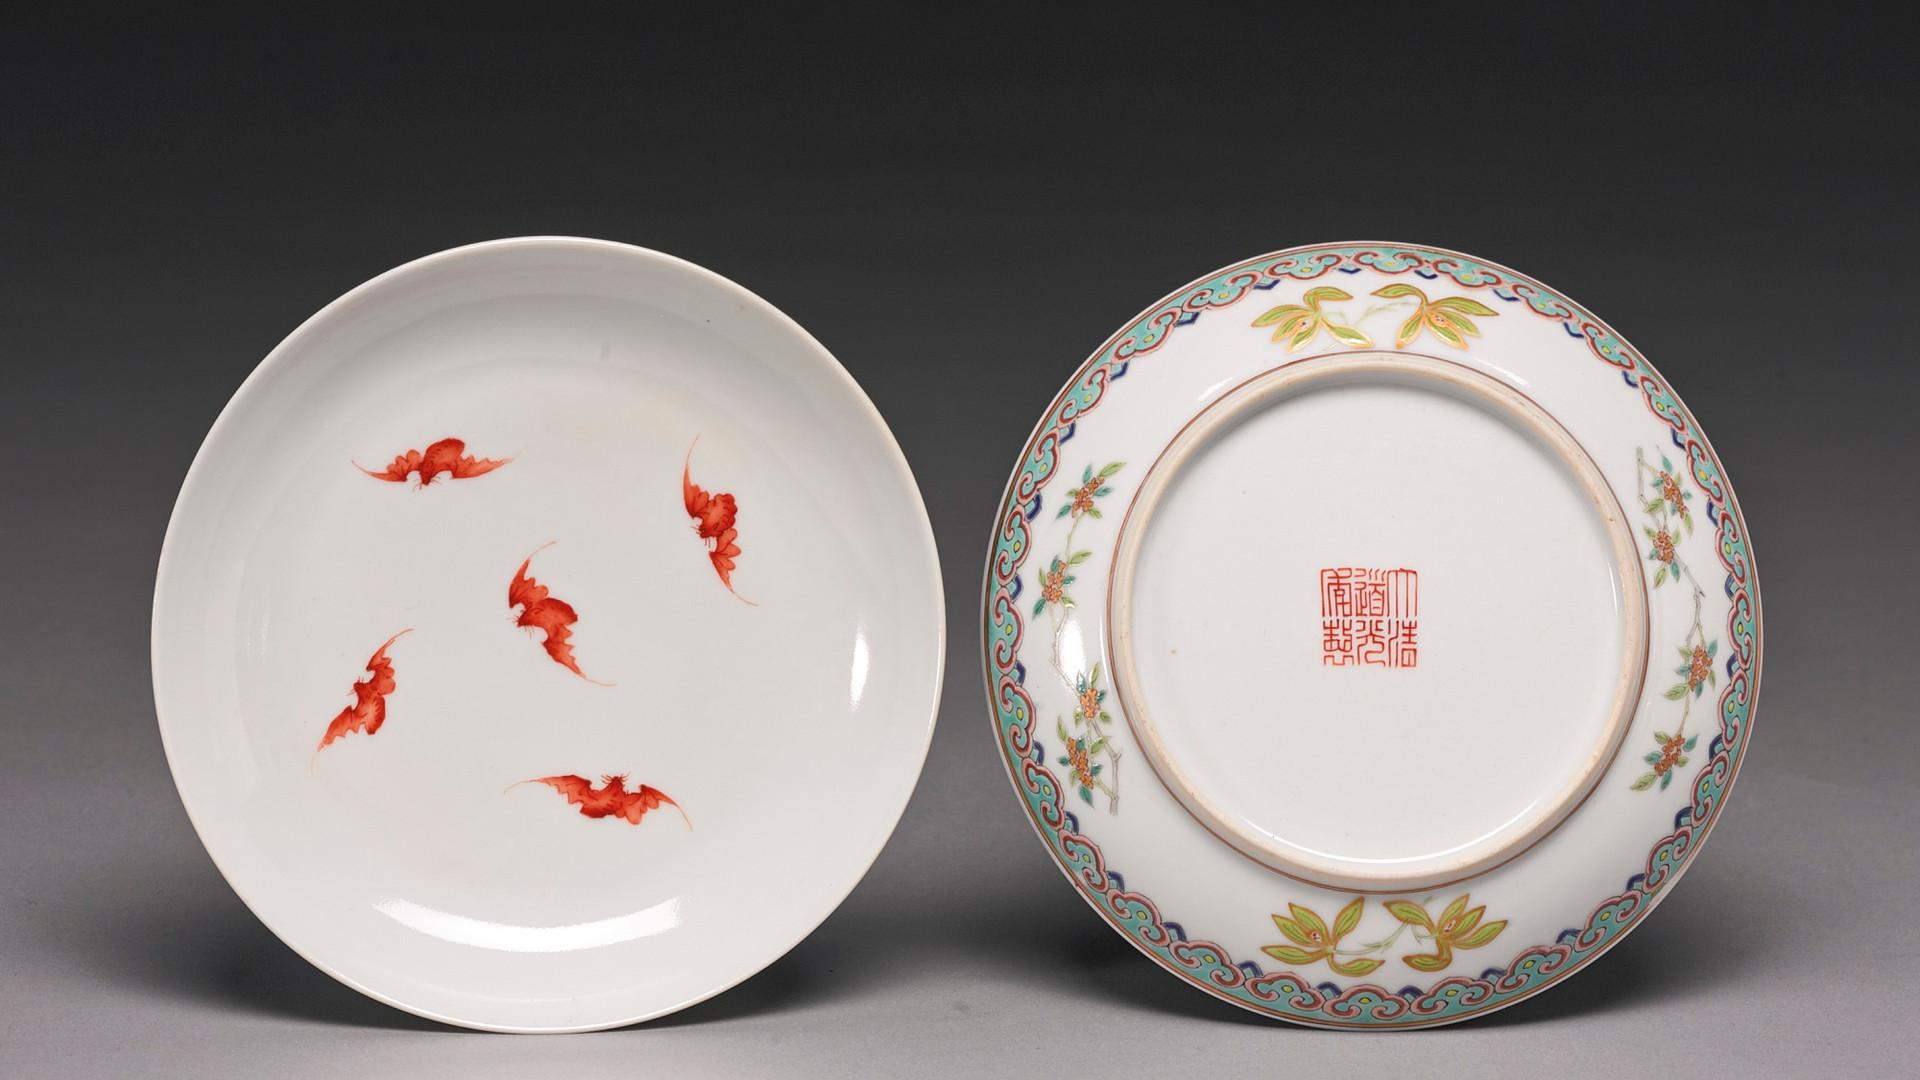 Antique Wufu China Plates